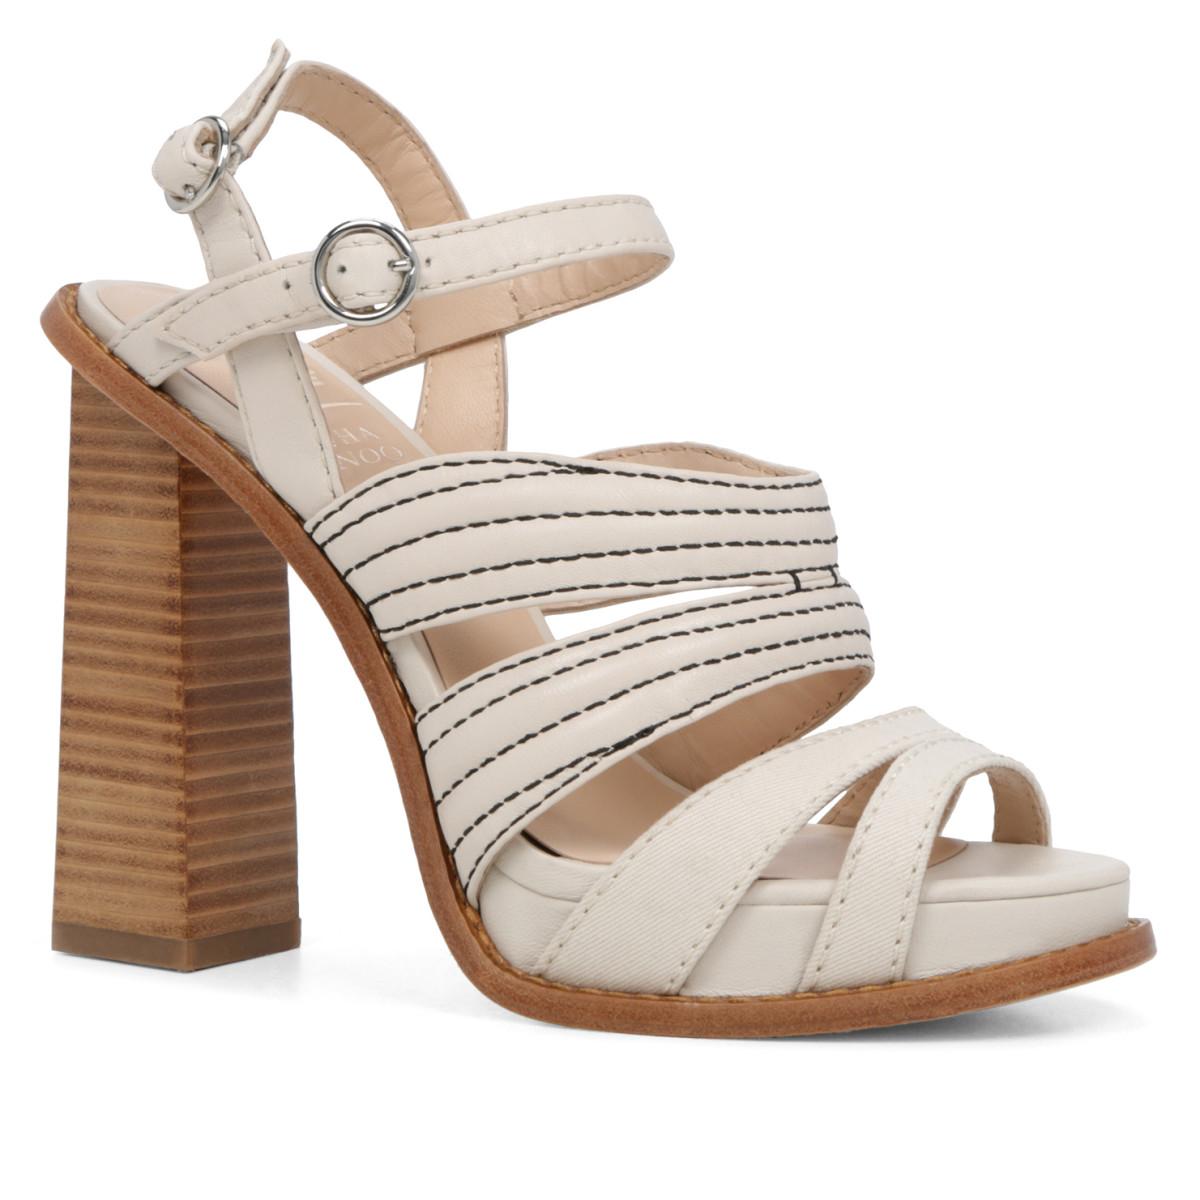 Aldo gift-card giveaway_Misha Nonoo SHANTELL stacked heel sandal